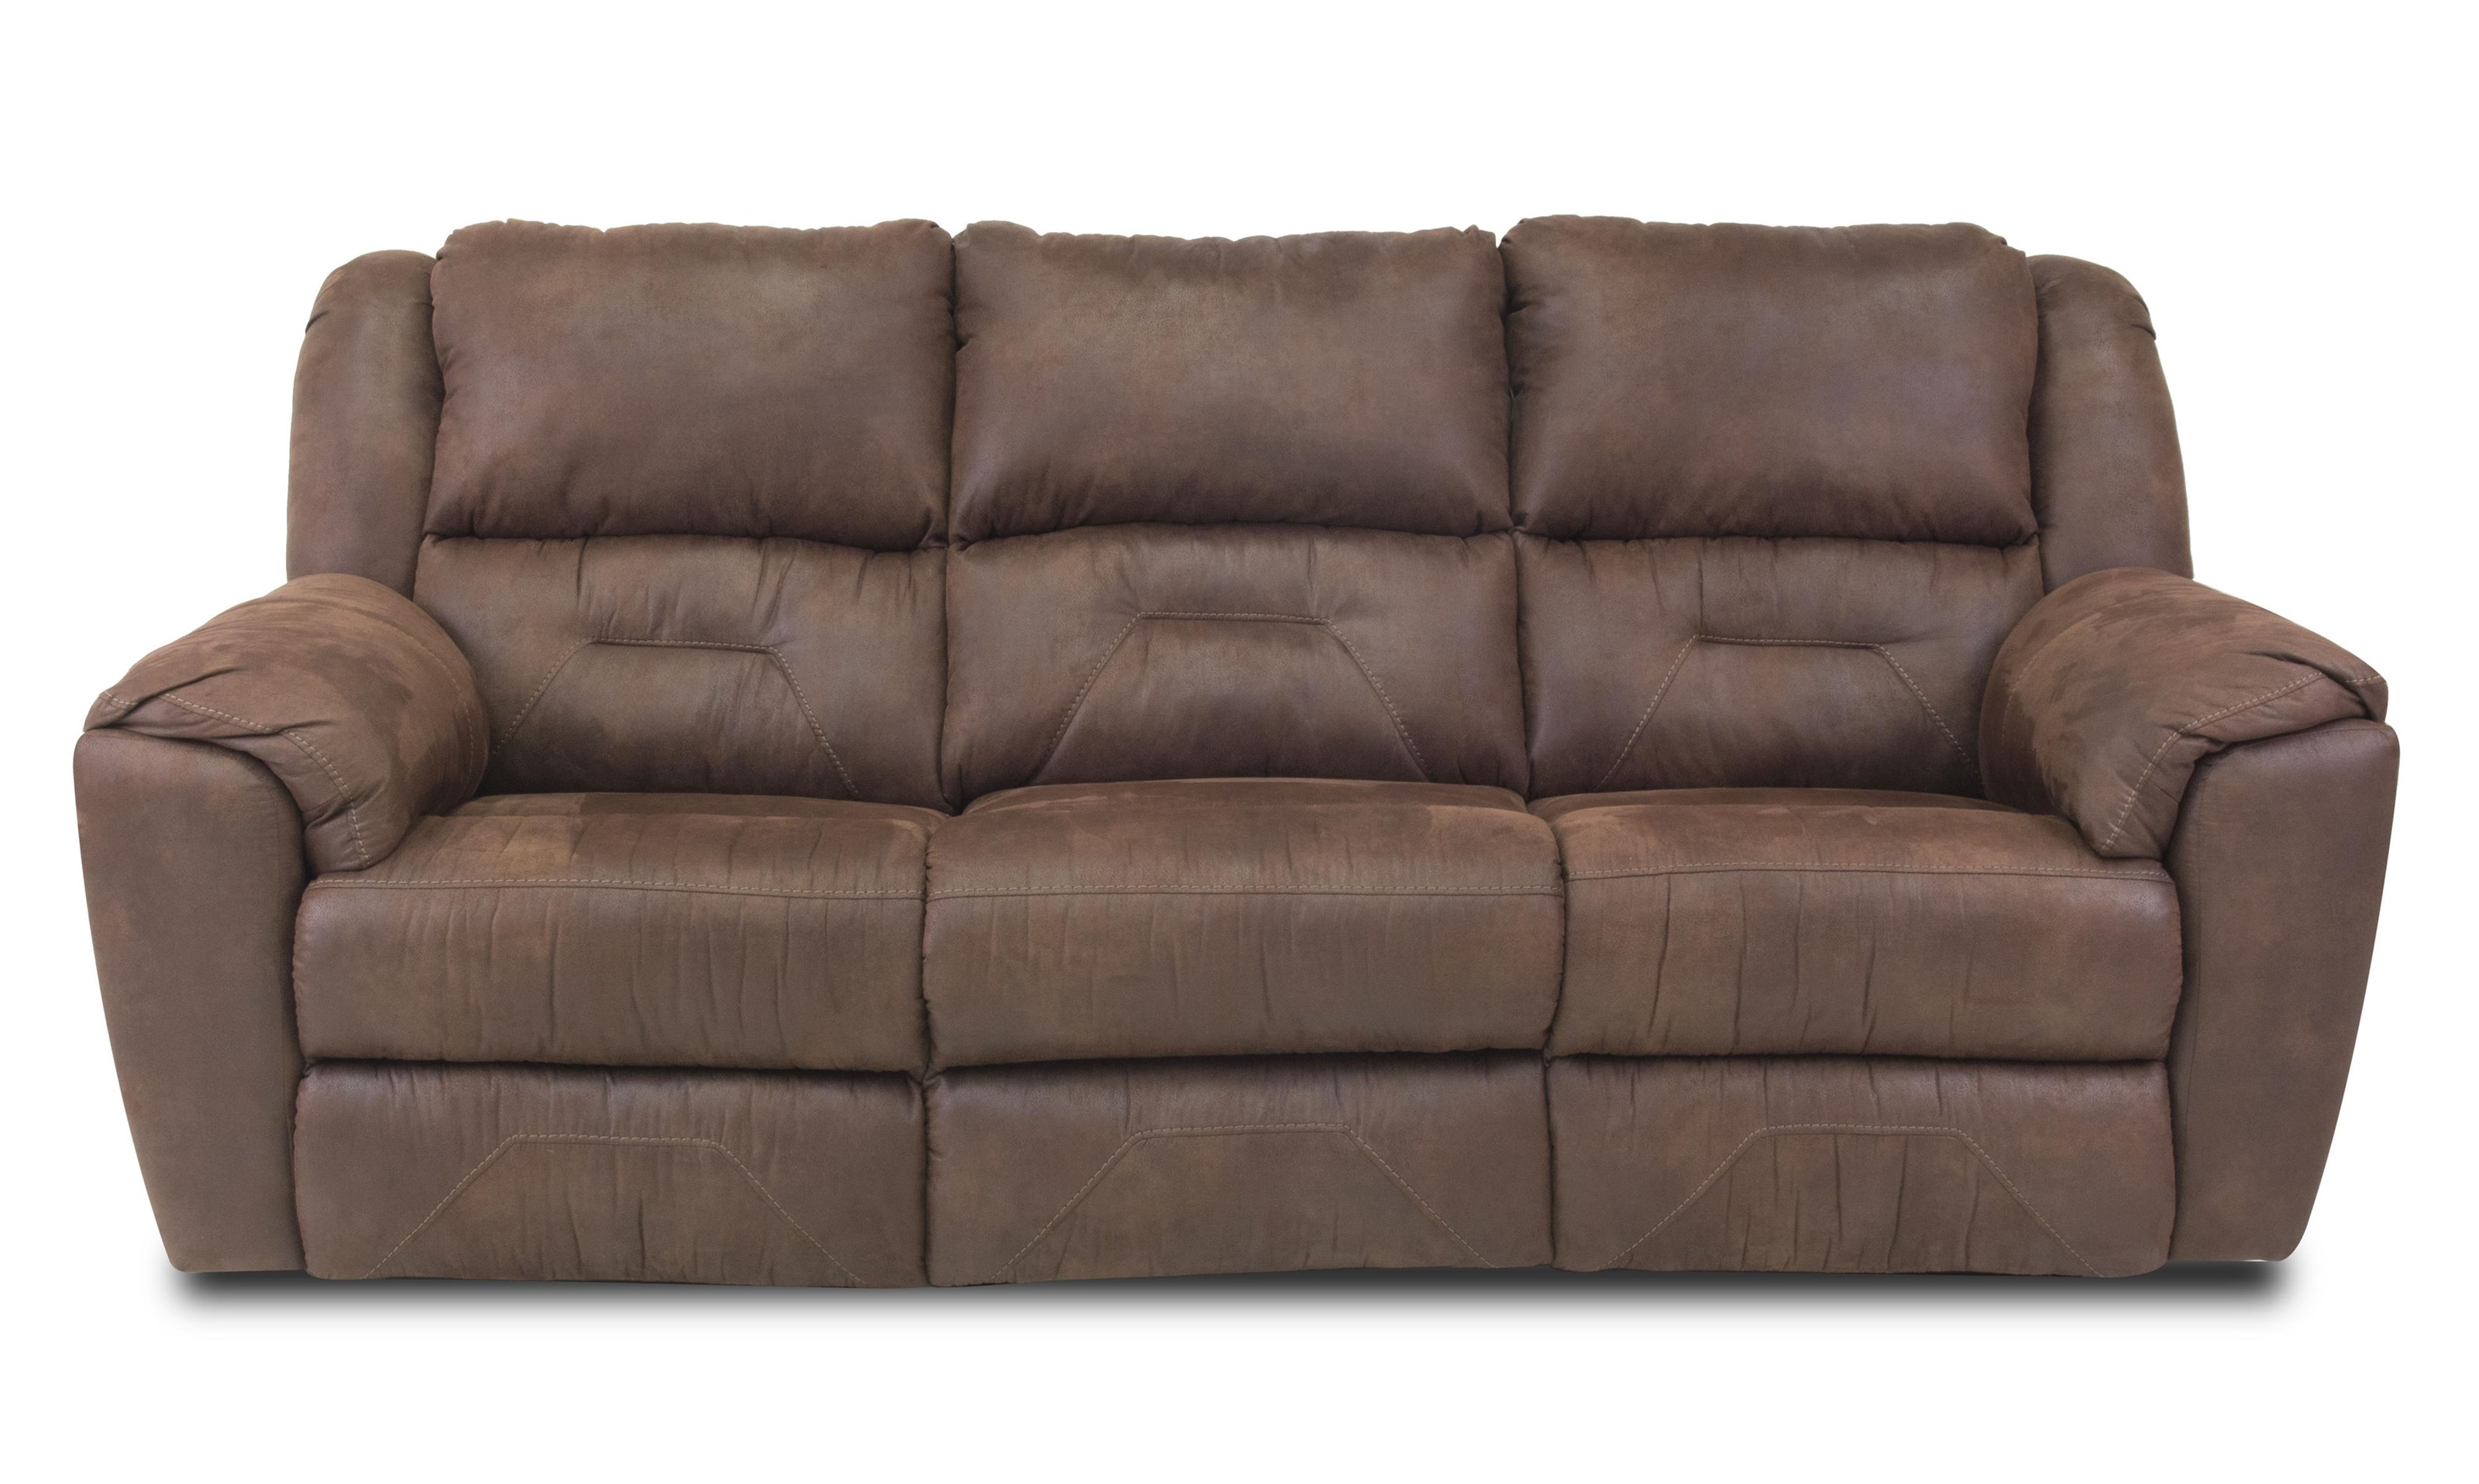 Reclining Sofa with 2 Reclining Seats